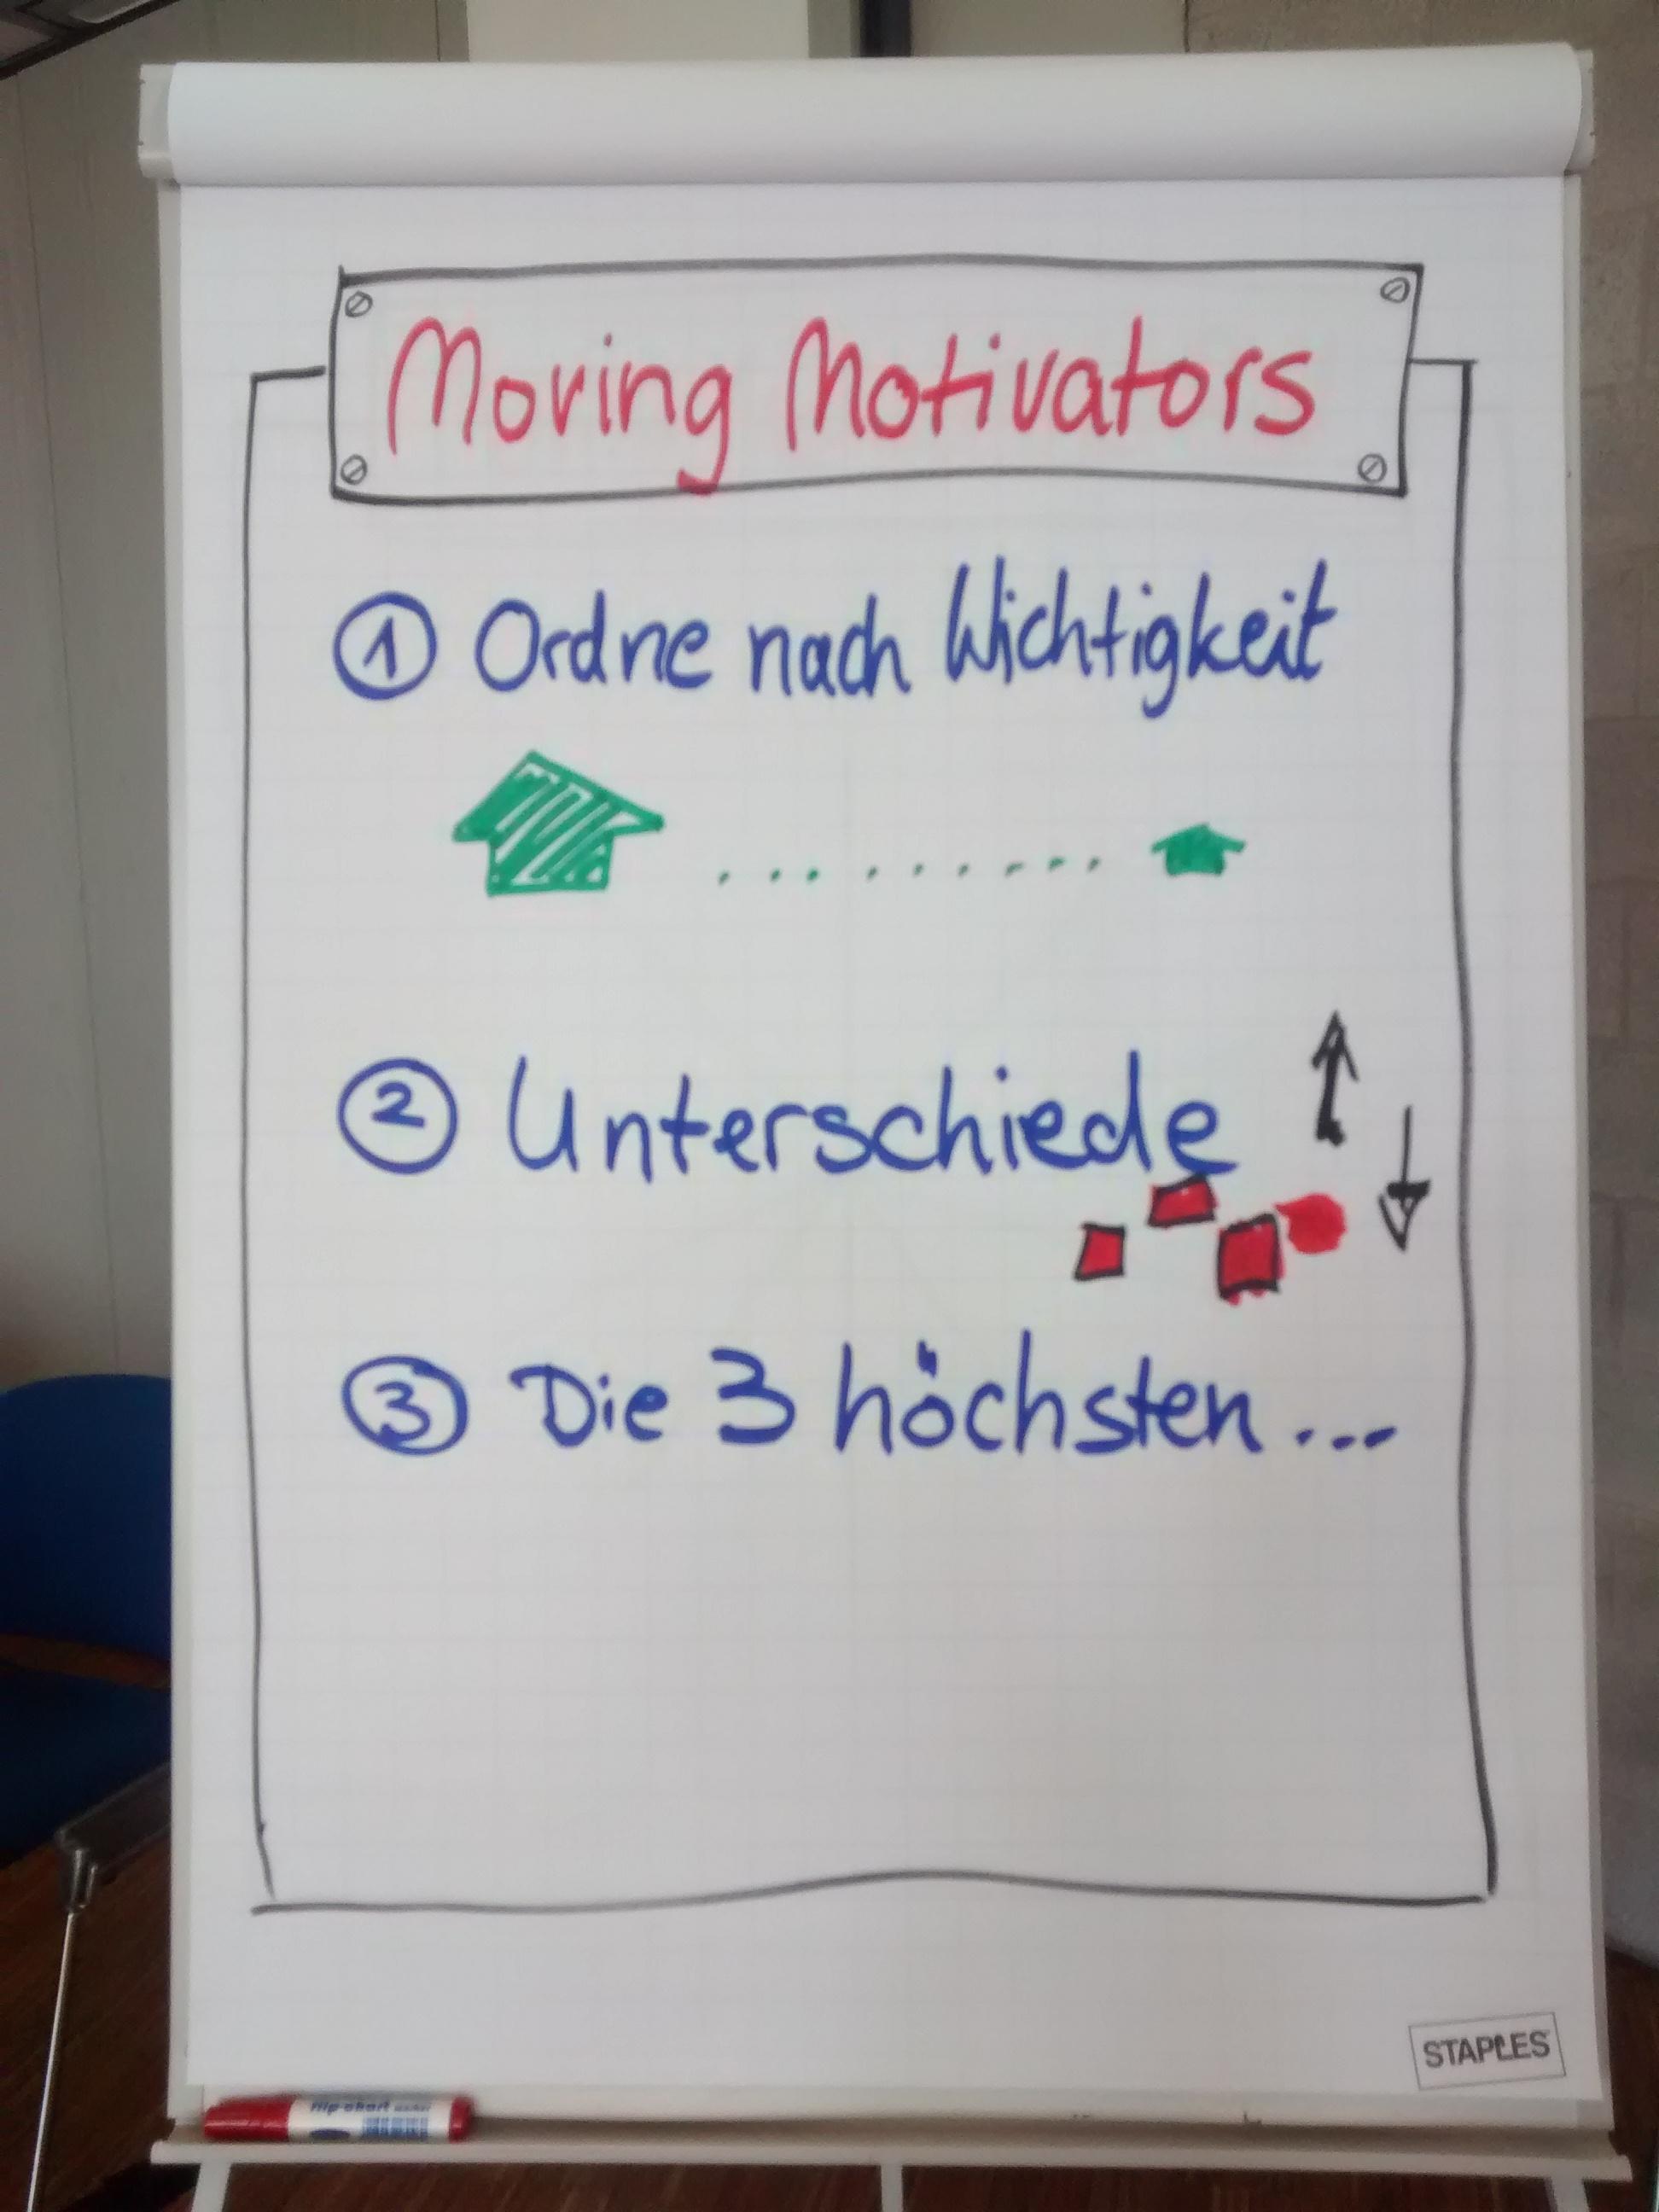 05-moving-motivators